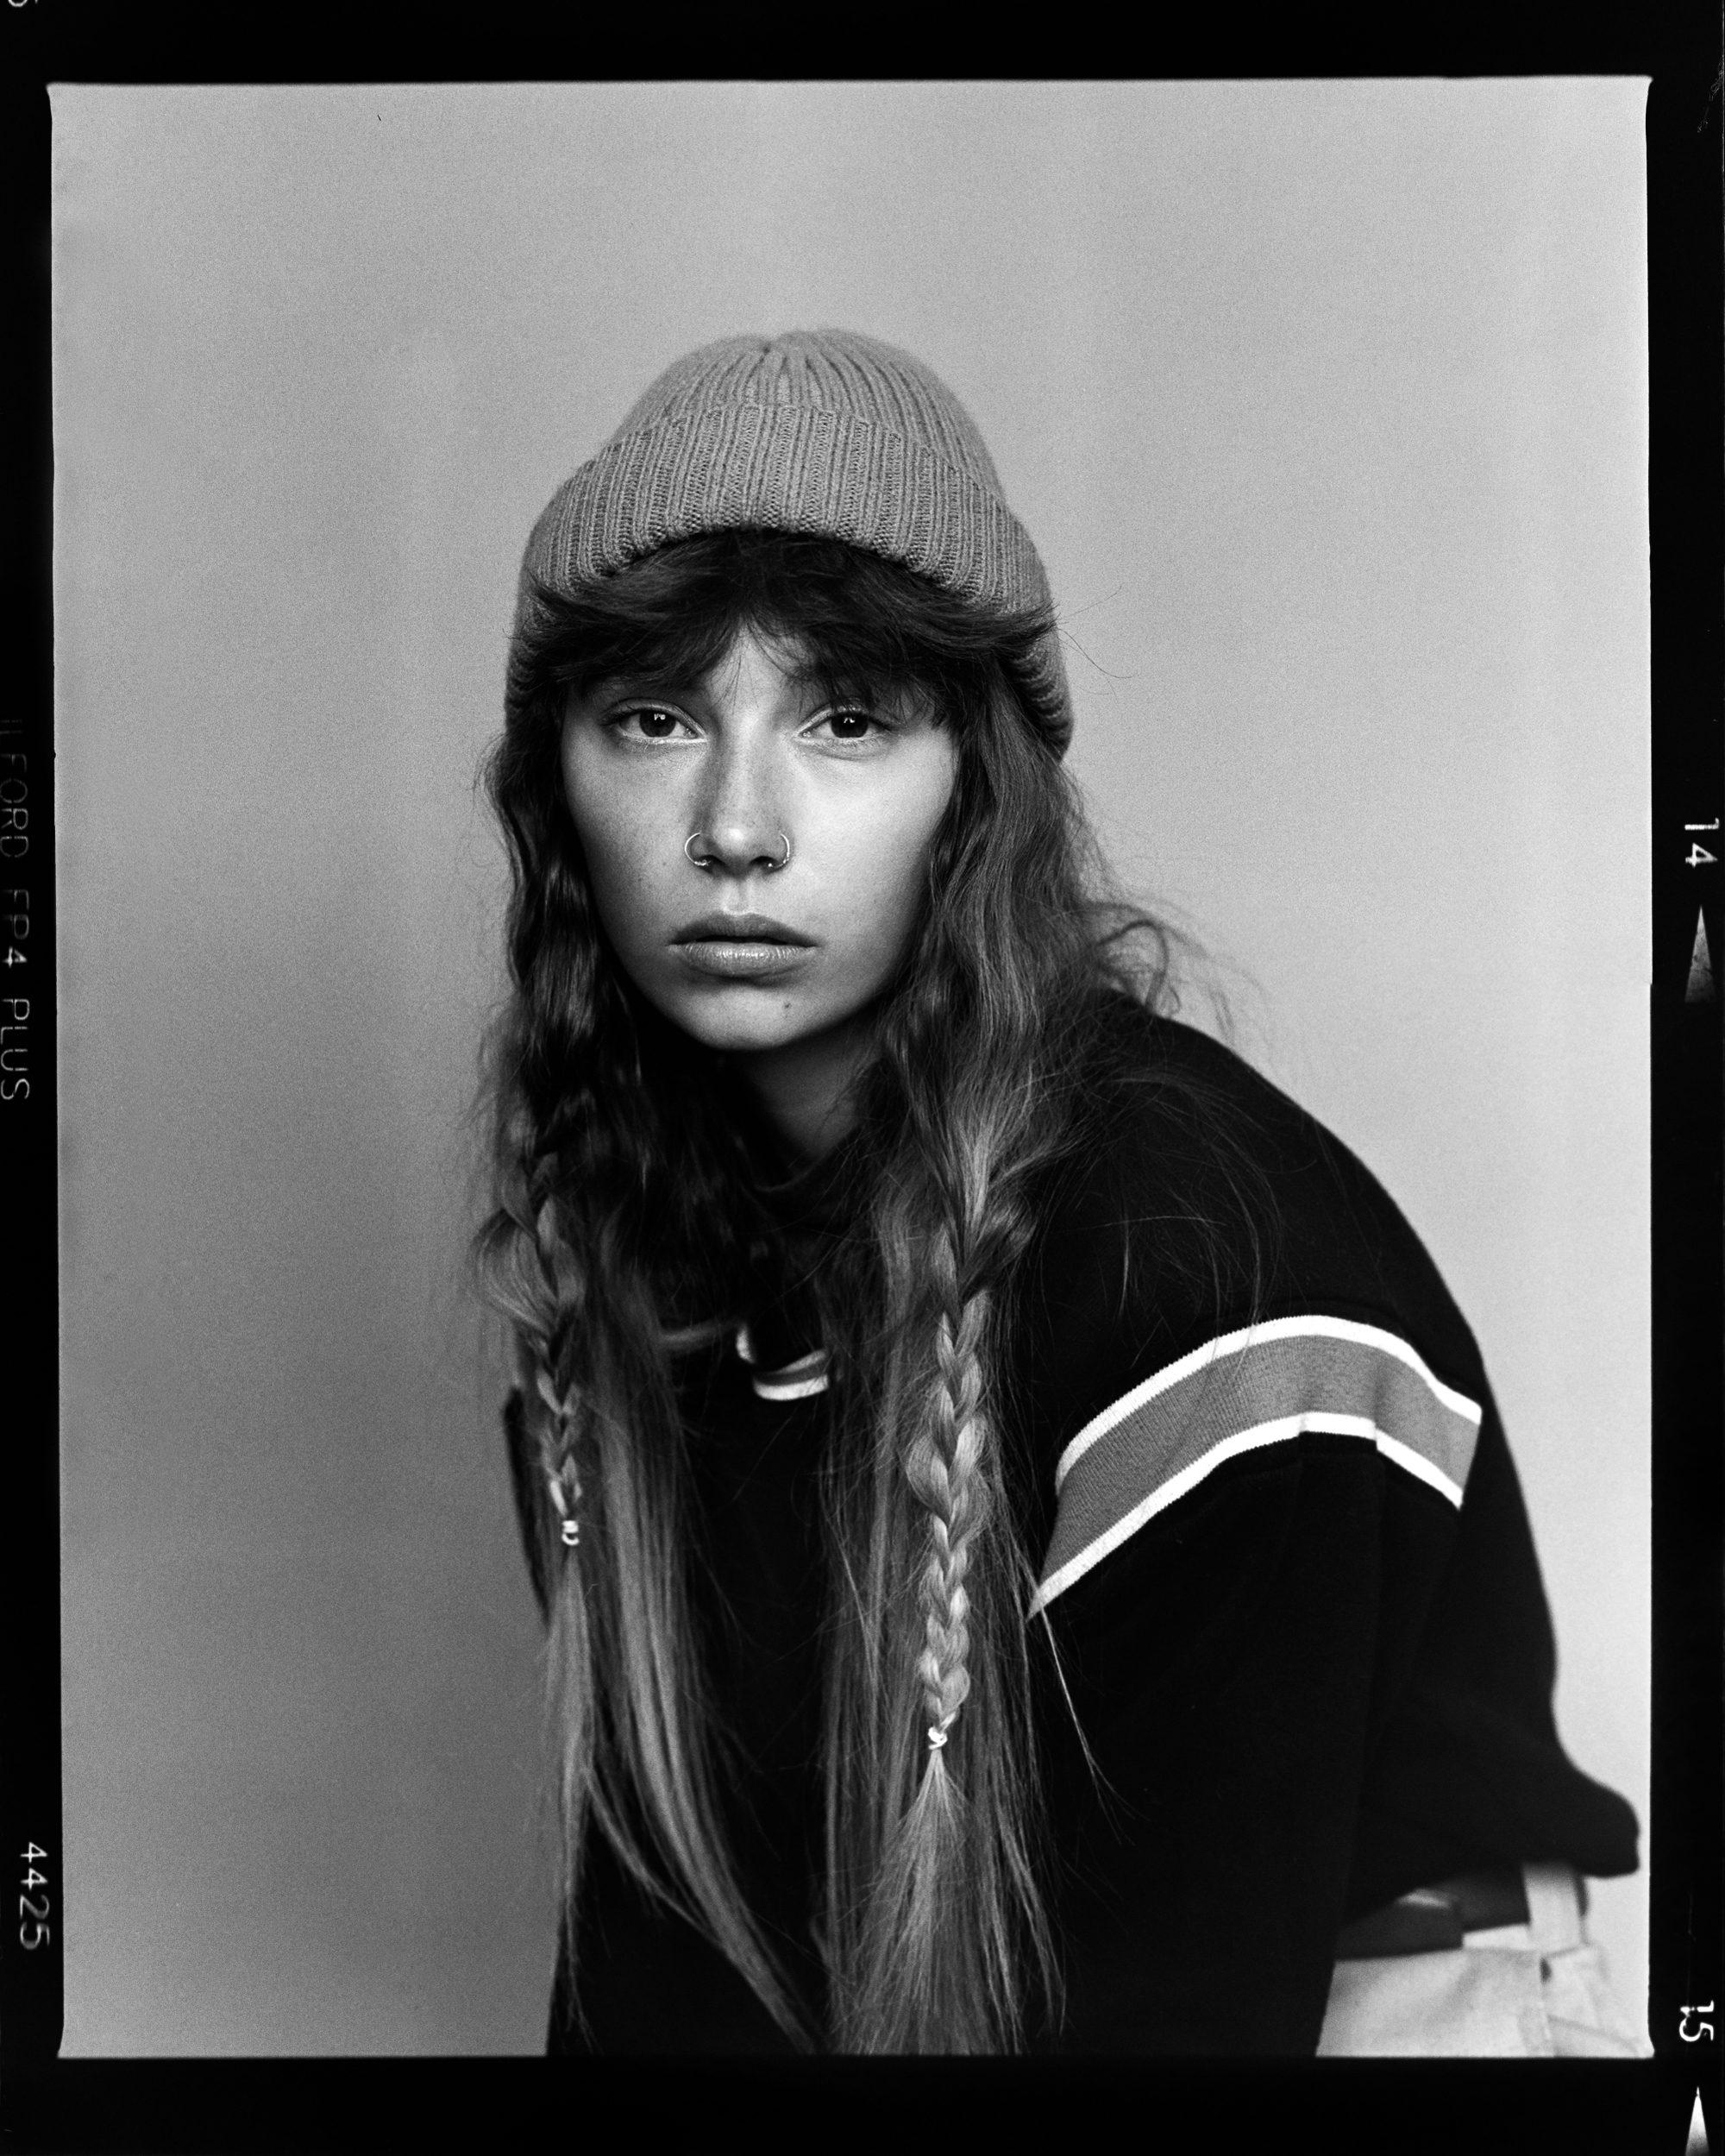 black and white portraits shot on ILFORD FP4 Plus film by Craig Fleming